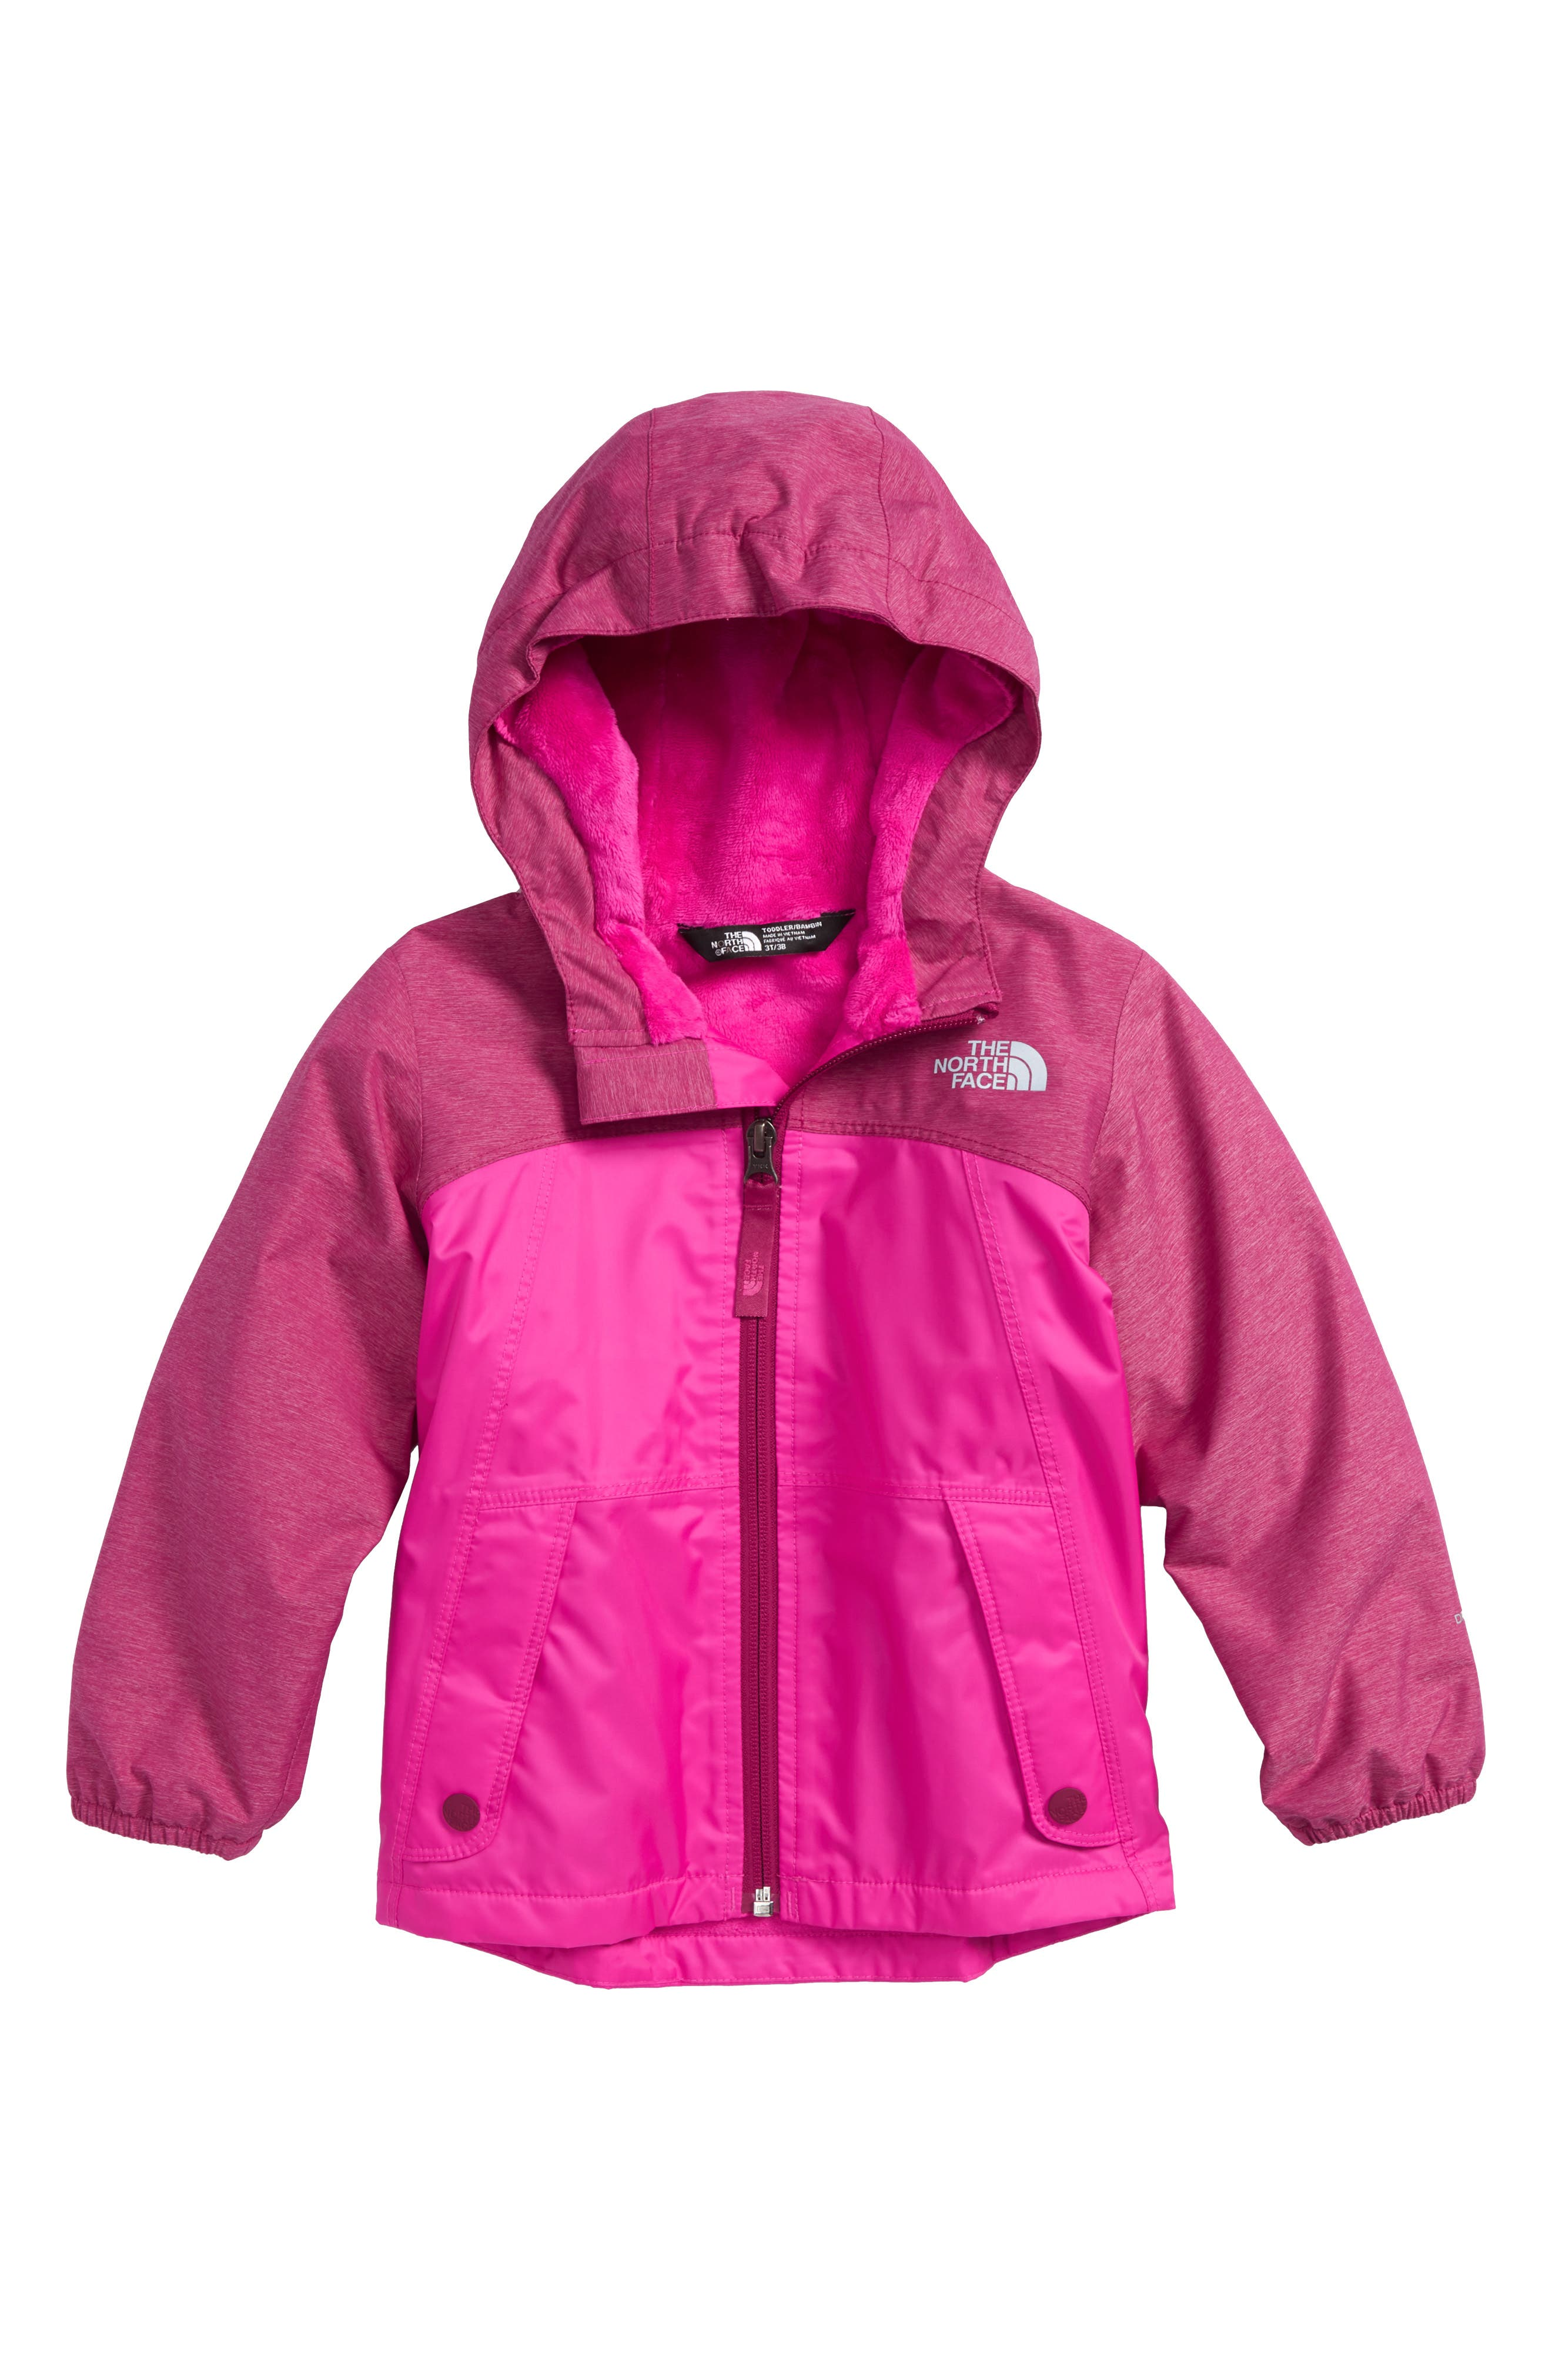 Warm Storm Waterproof Jacket,                             Main thumbnail 1, color,                             DRAMATIC PLUM HEATHER